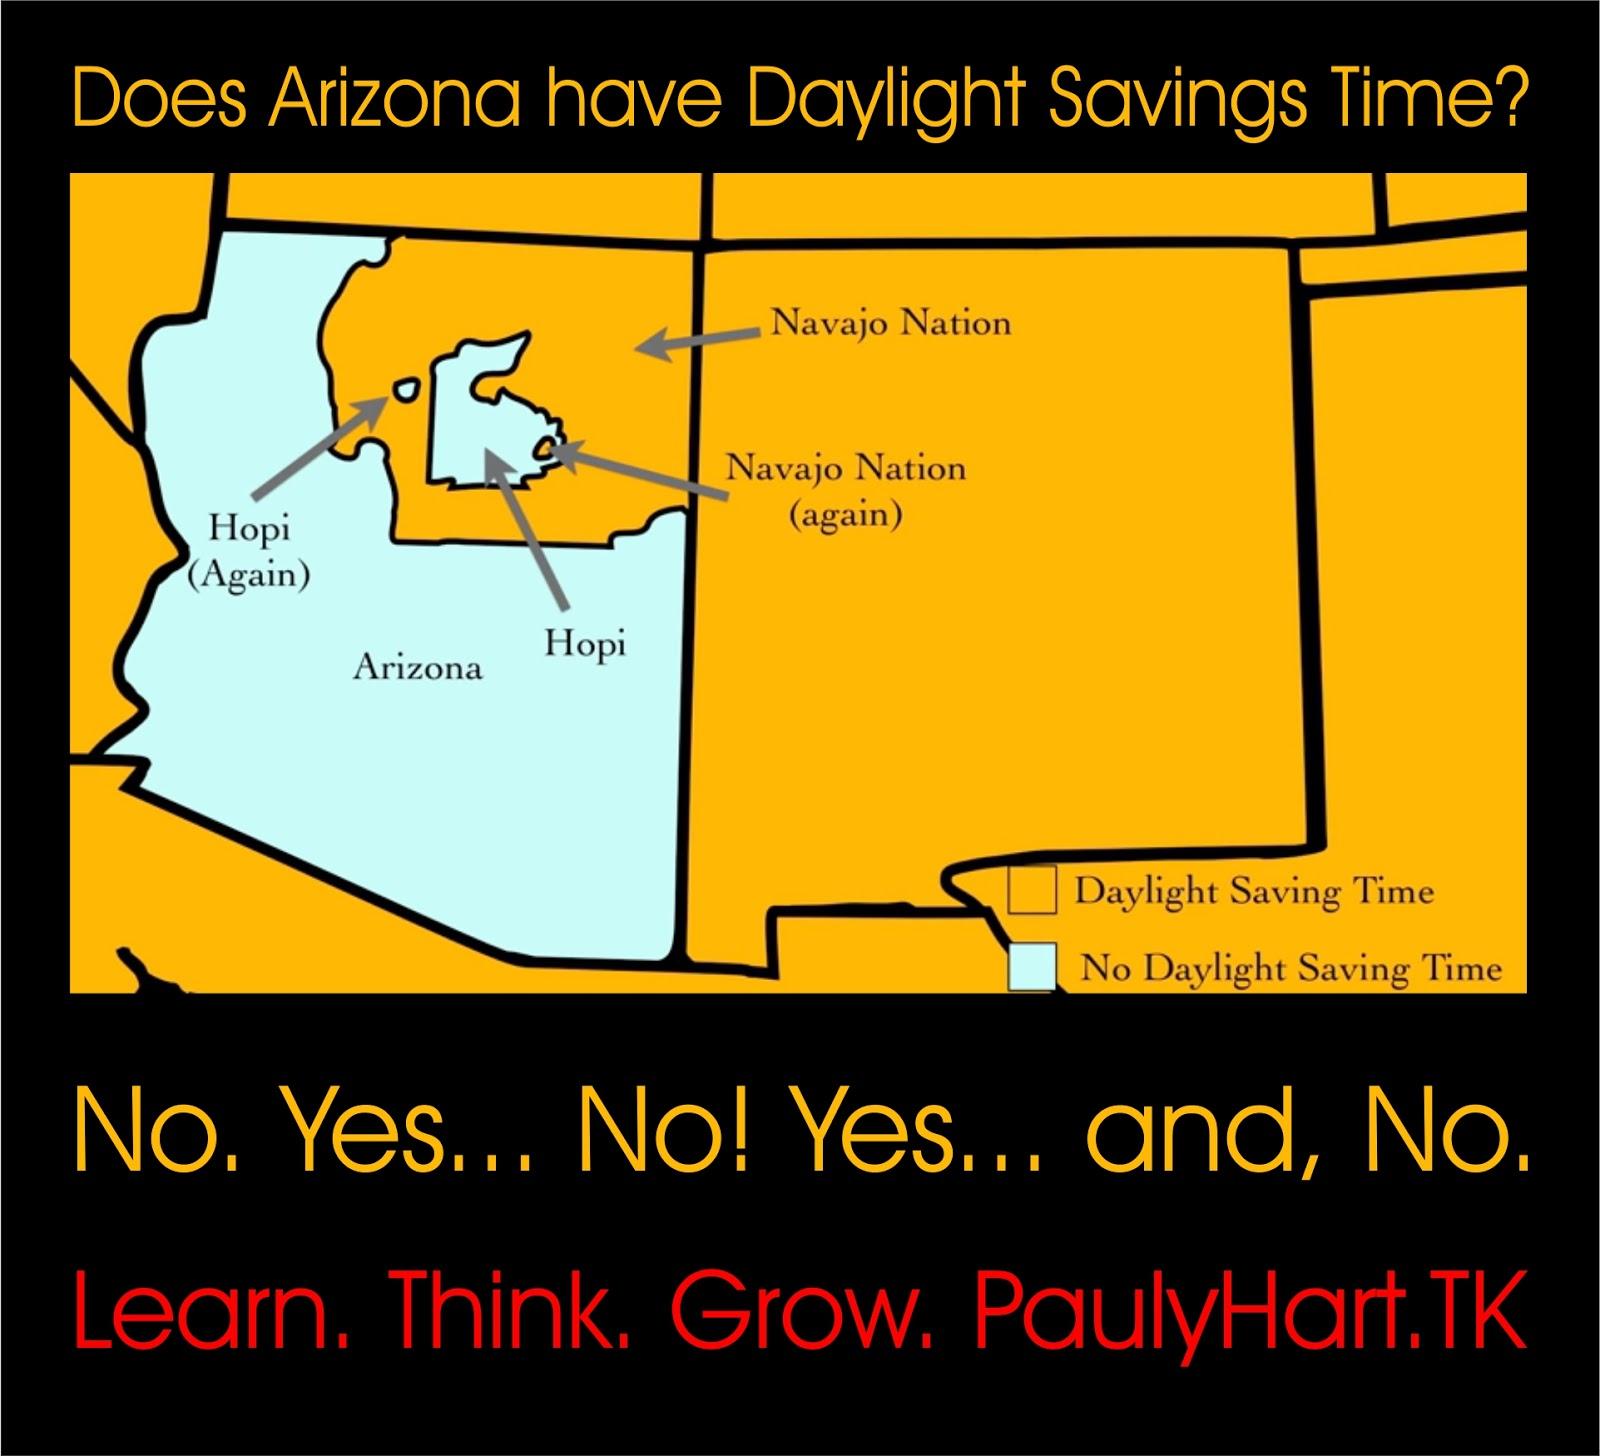 Map Of Arizona Daylight Savings Time.Arizona Daylight Savings Map Bnhspine Com